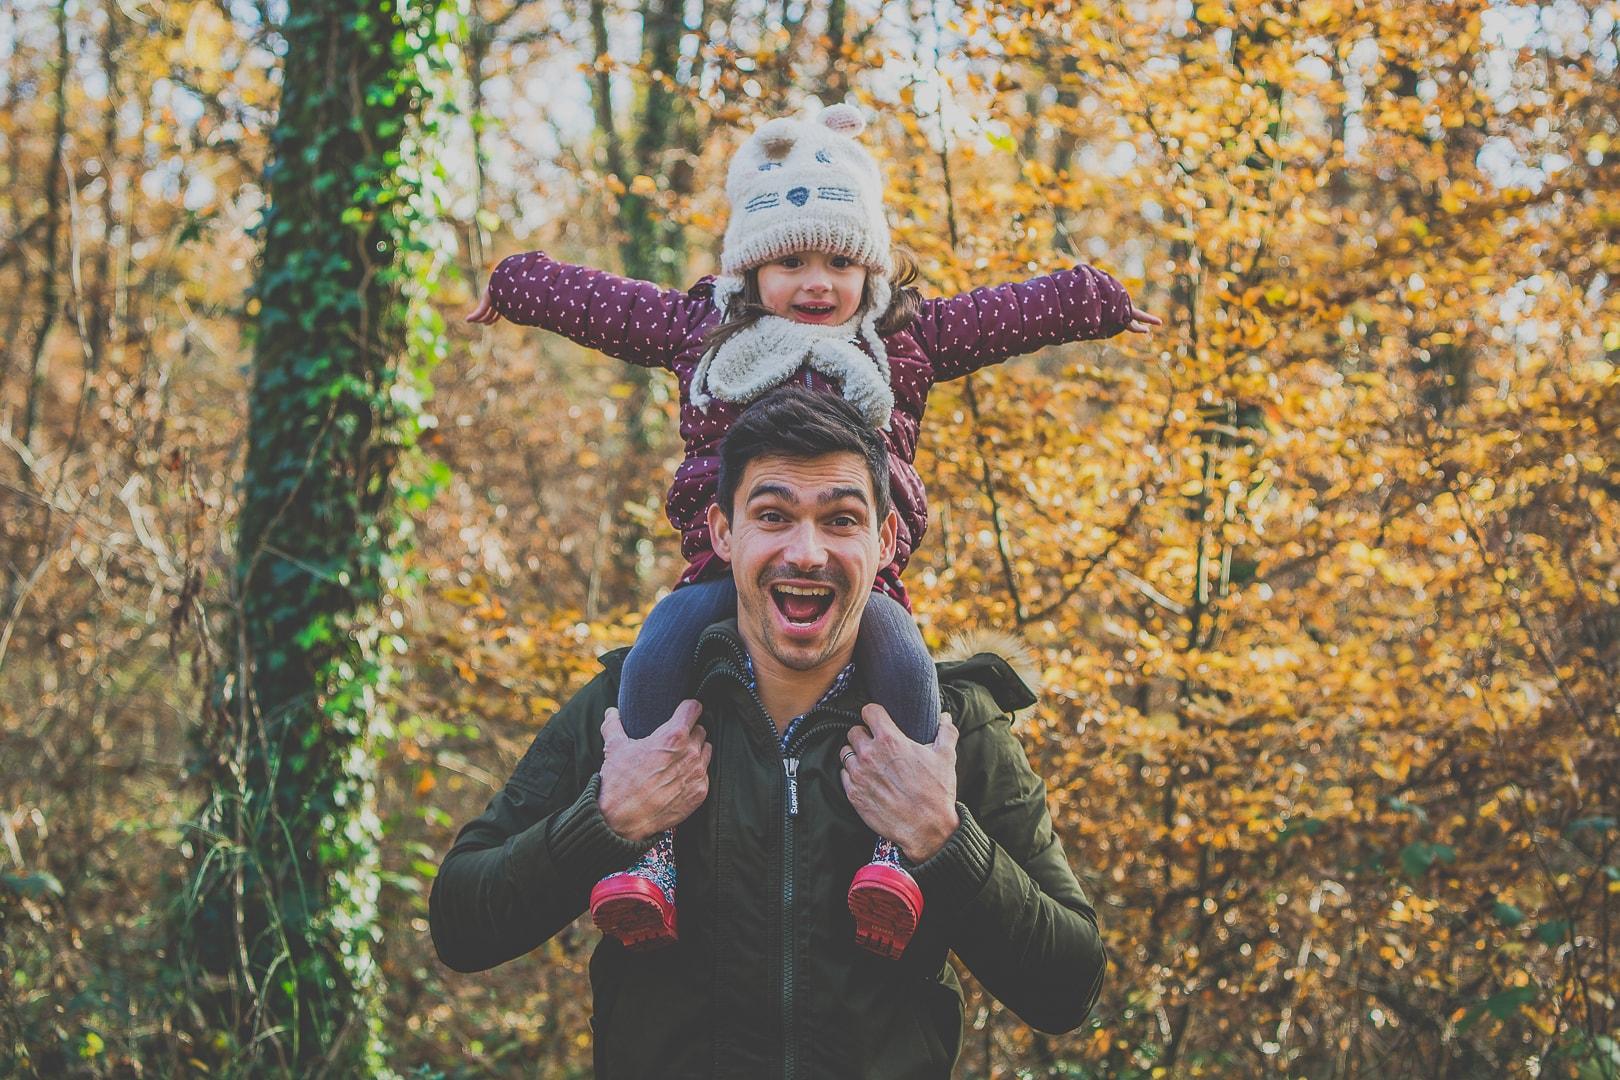 trezors-photography-photographe-professionnel-toulouse-31-enfance-seance-famille-lifestyle (25)